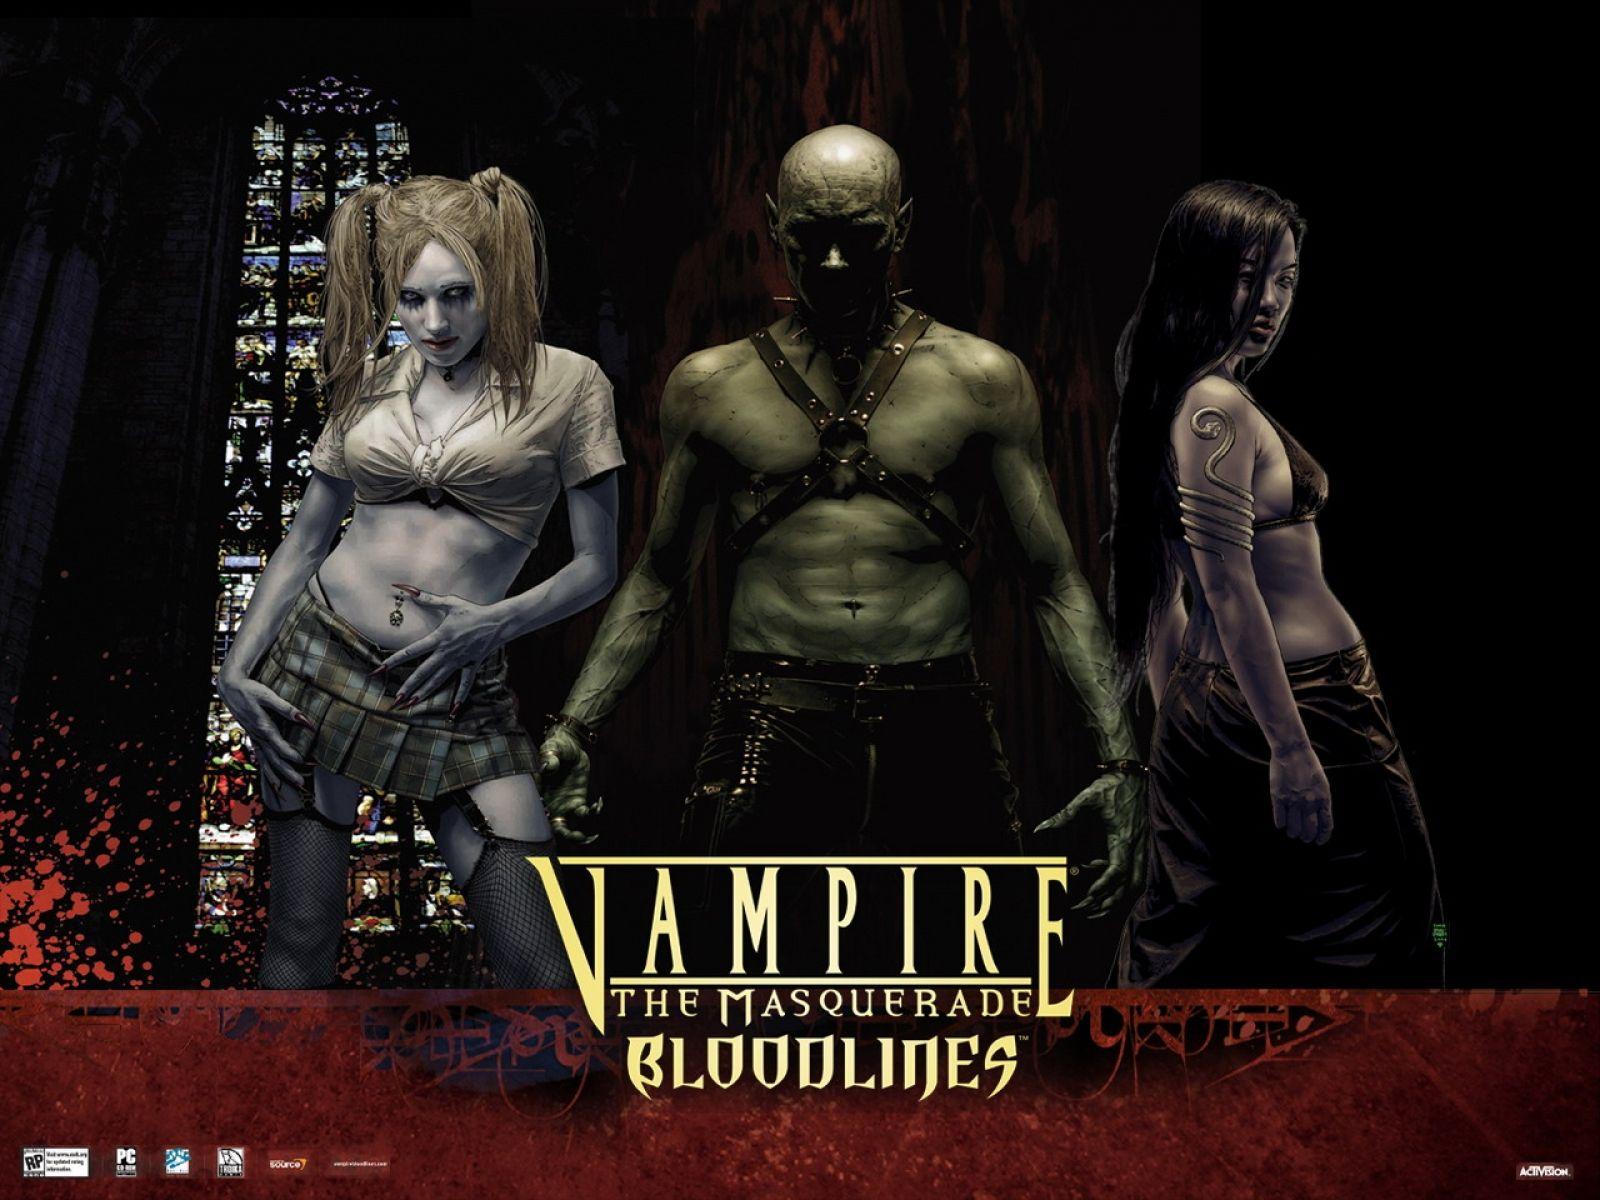 Vampire: The Masquerade Bloodhunt вышла в раннем доступе 7 сентября (b04da7f6f4aed000e0fd70605fa91fa1)